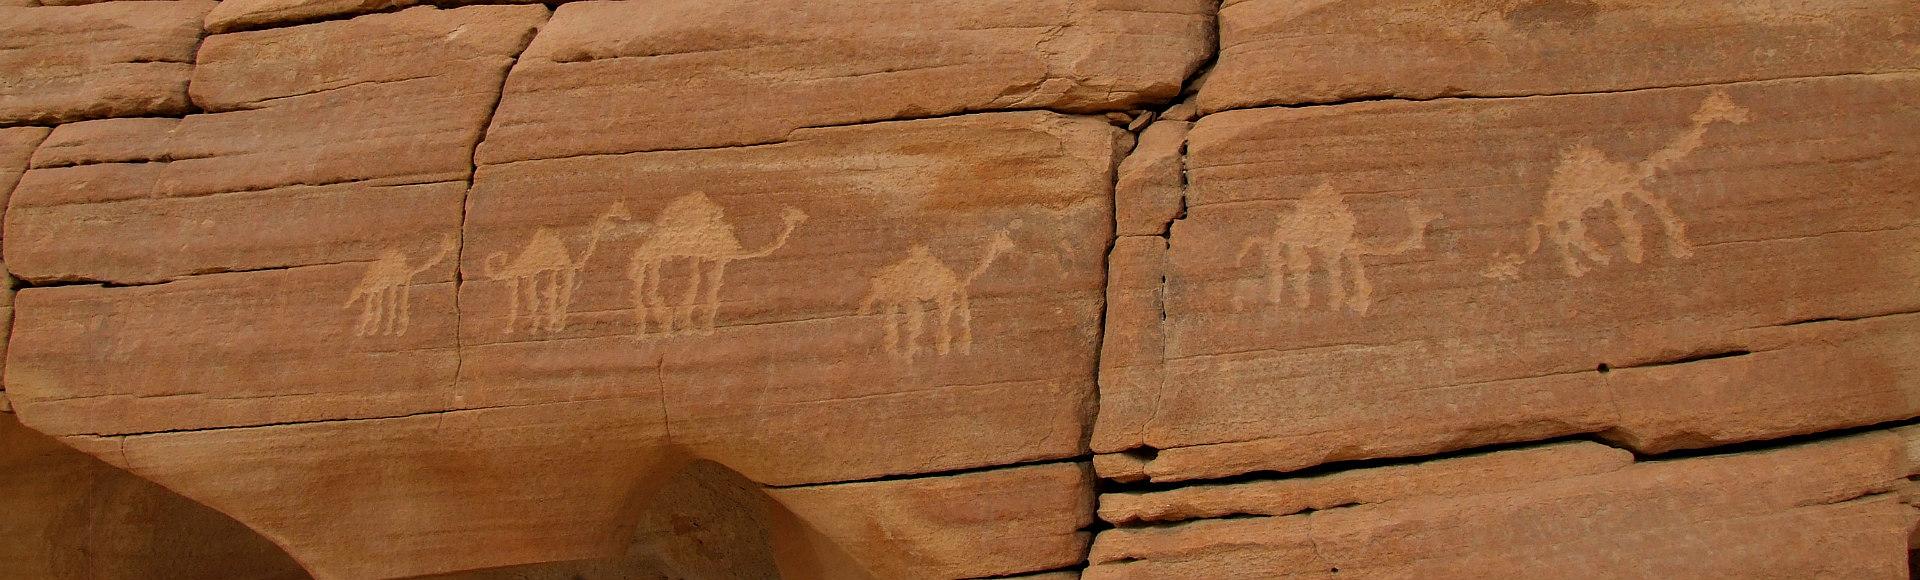 petroglyfen sinai woestijn DesertJoy